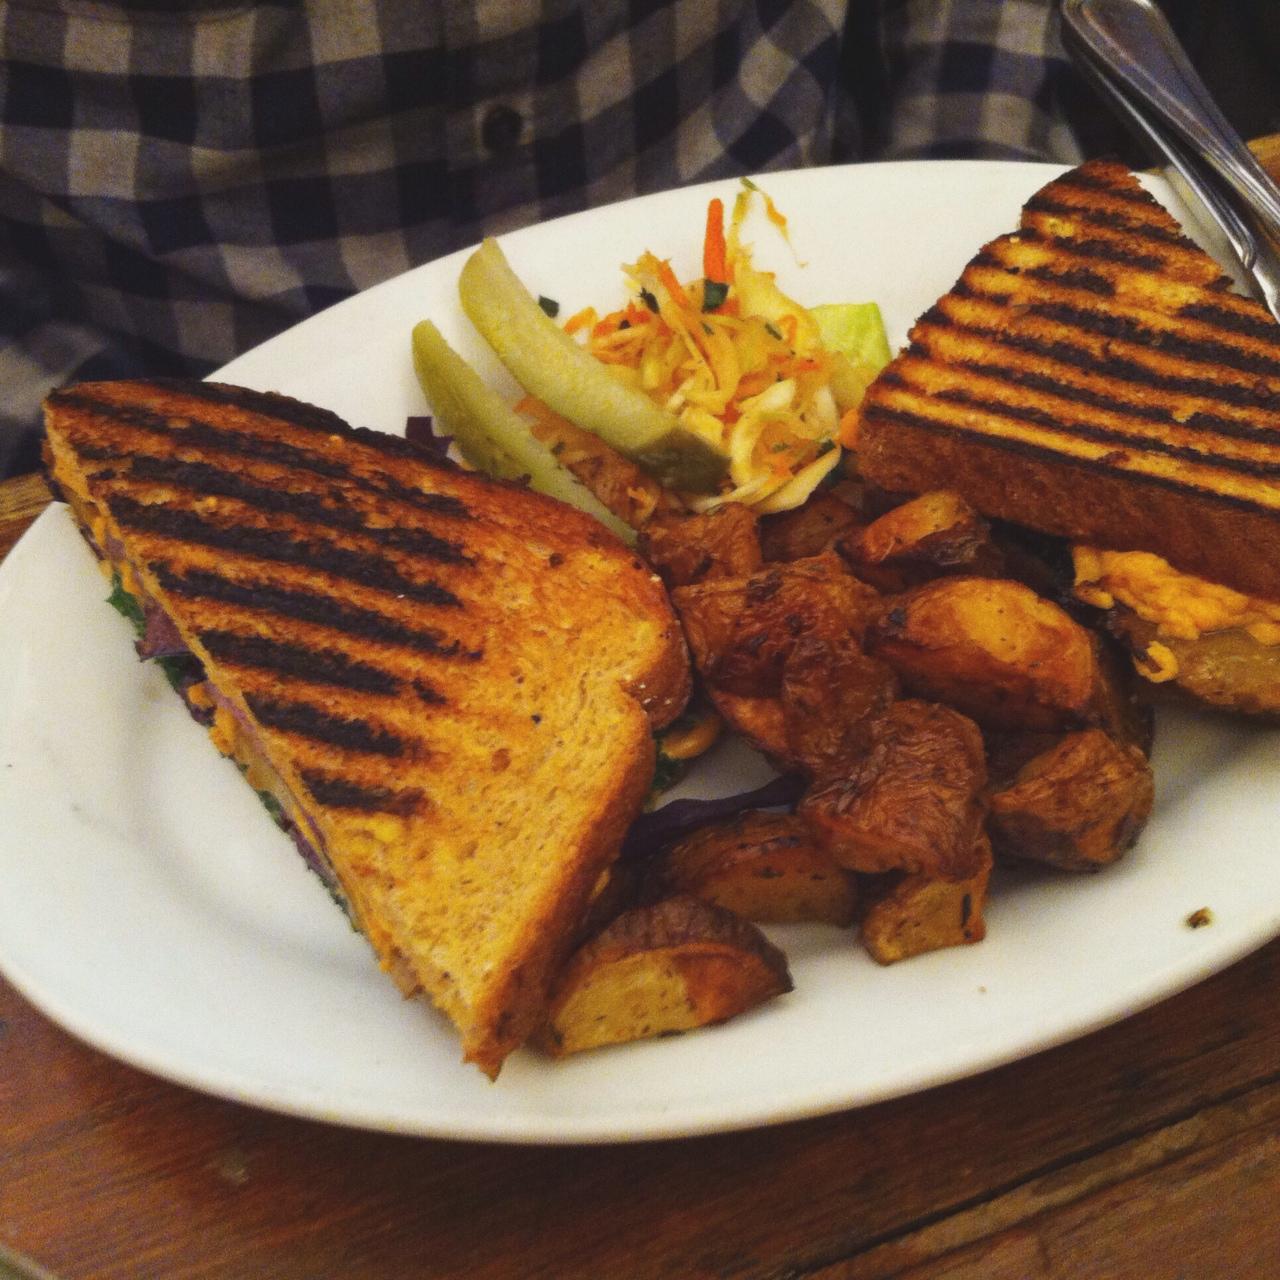 Seitan Sauerkraut Sandwich, The Organic Grill